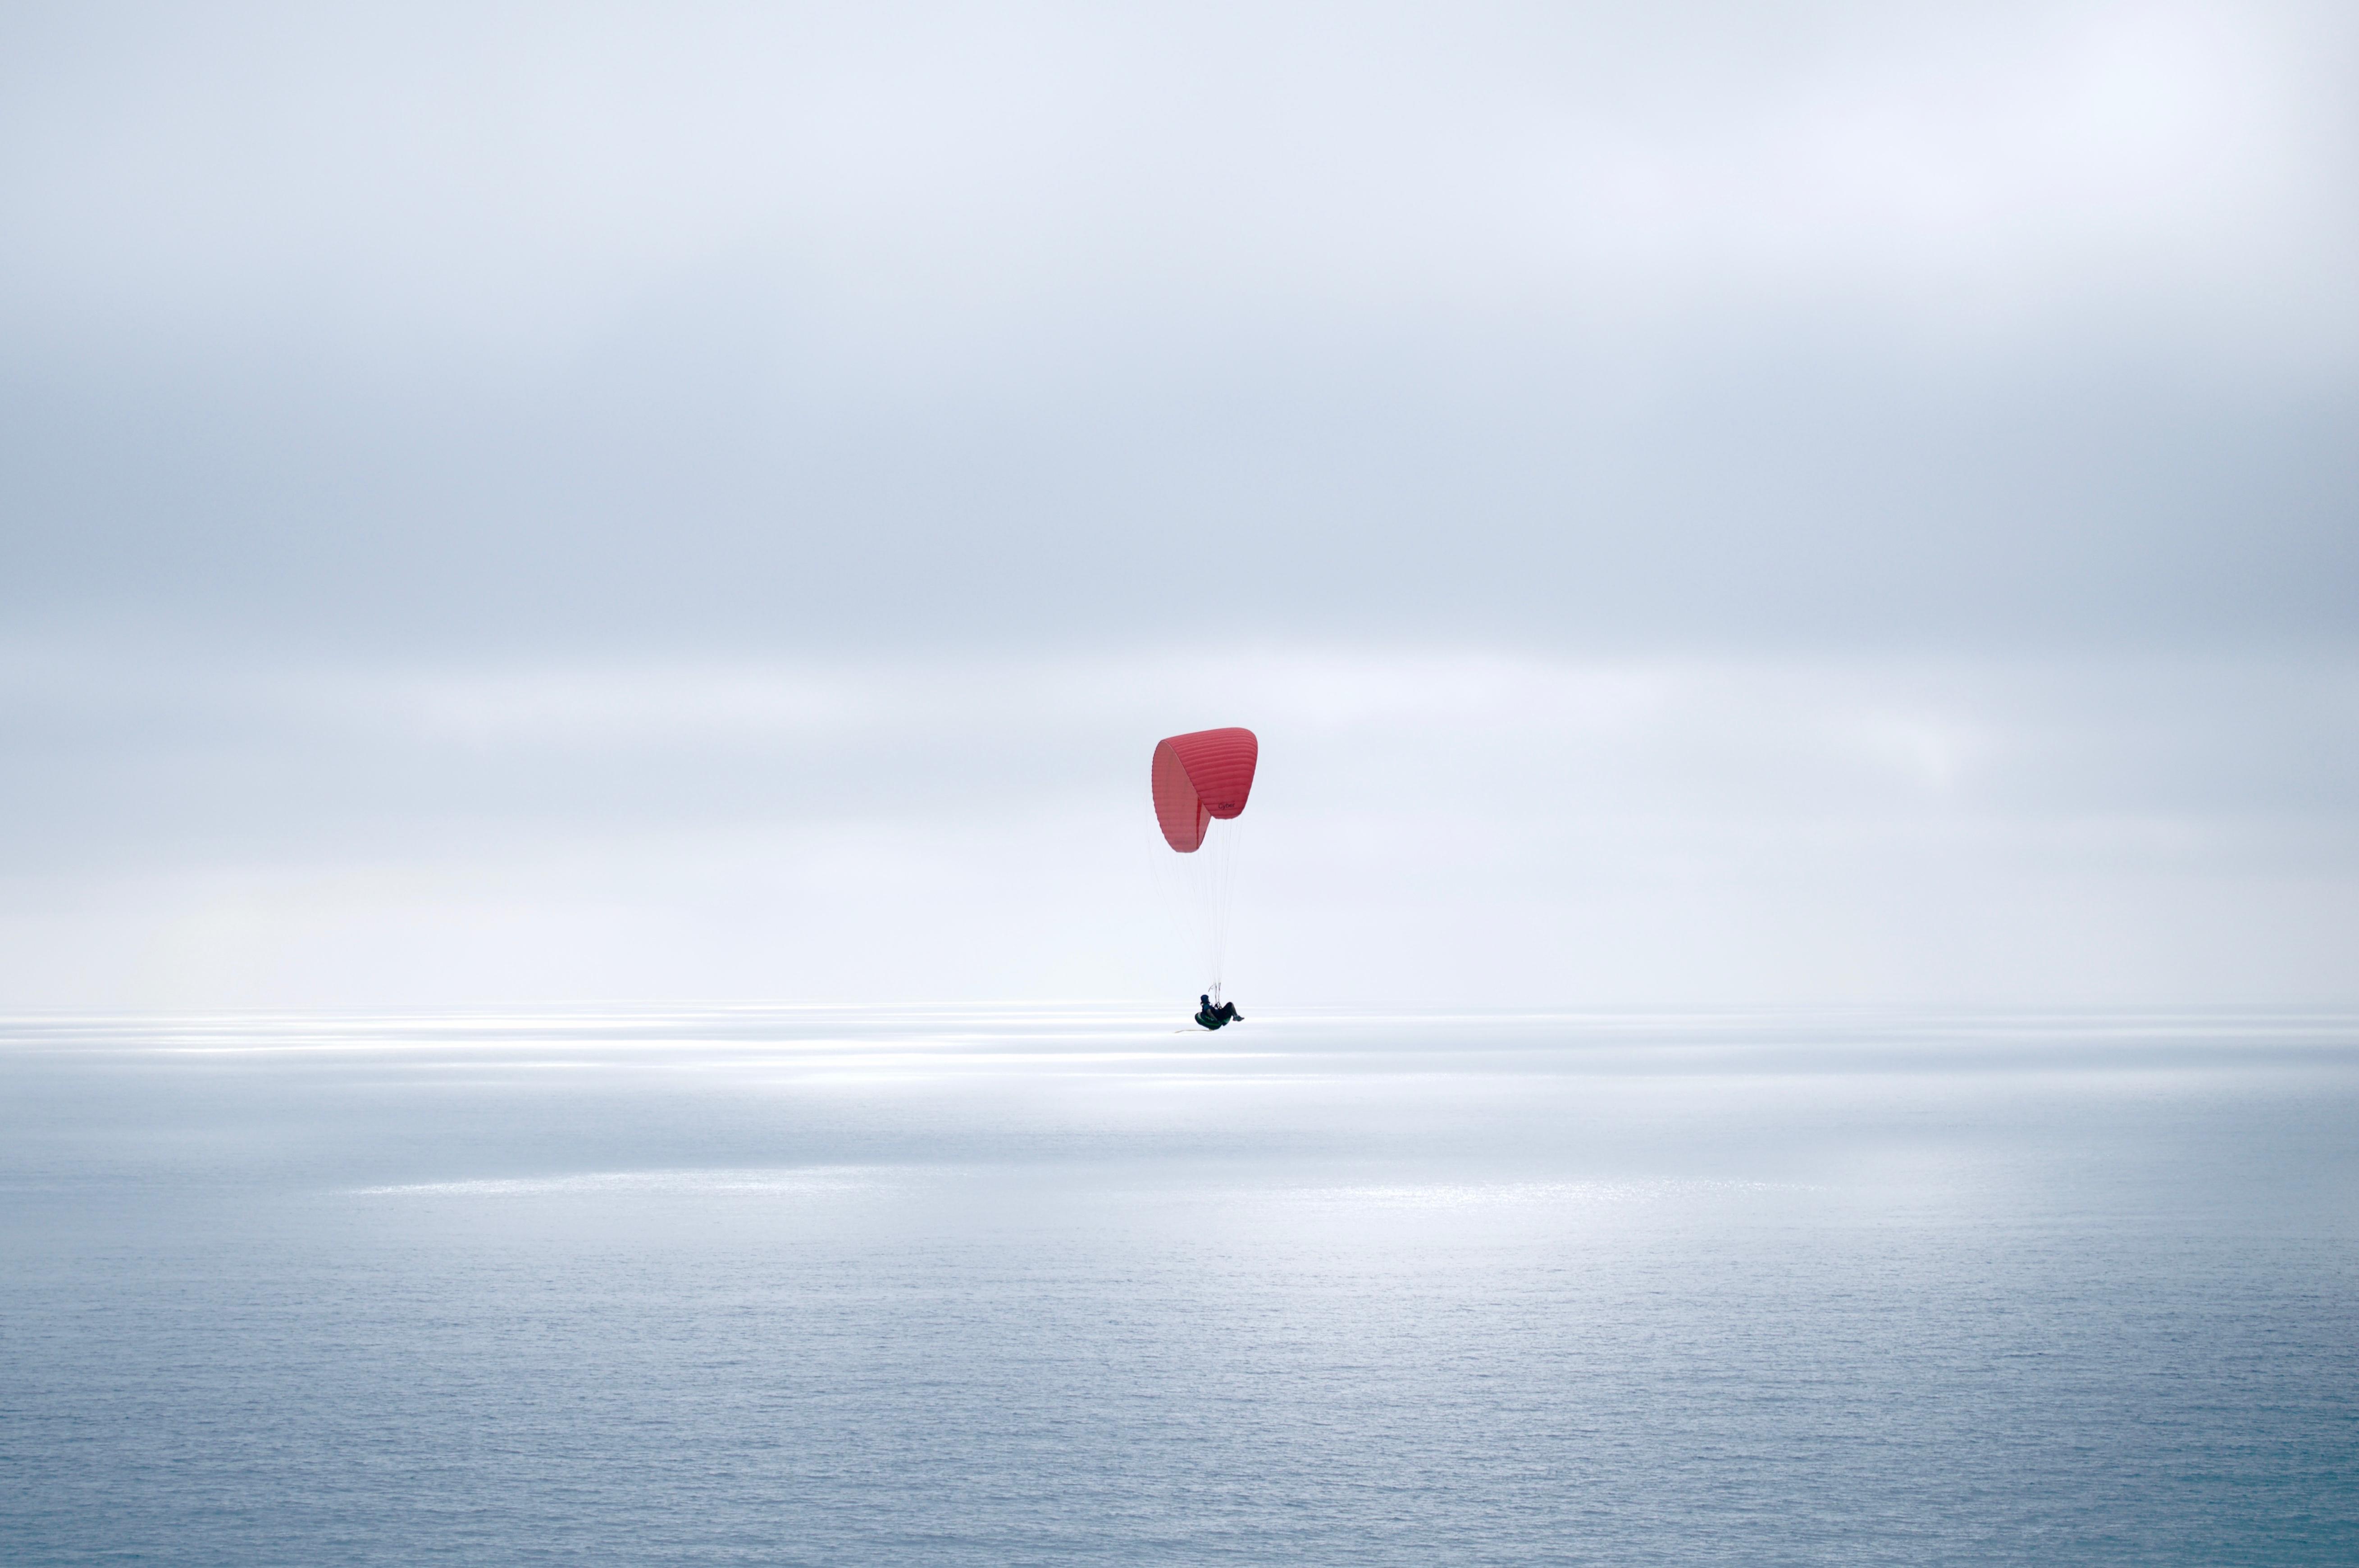 File:Paraglider at Black's Beach, La Jolla, San Diego